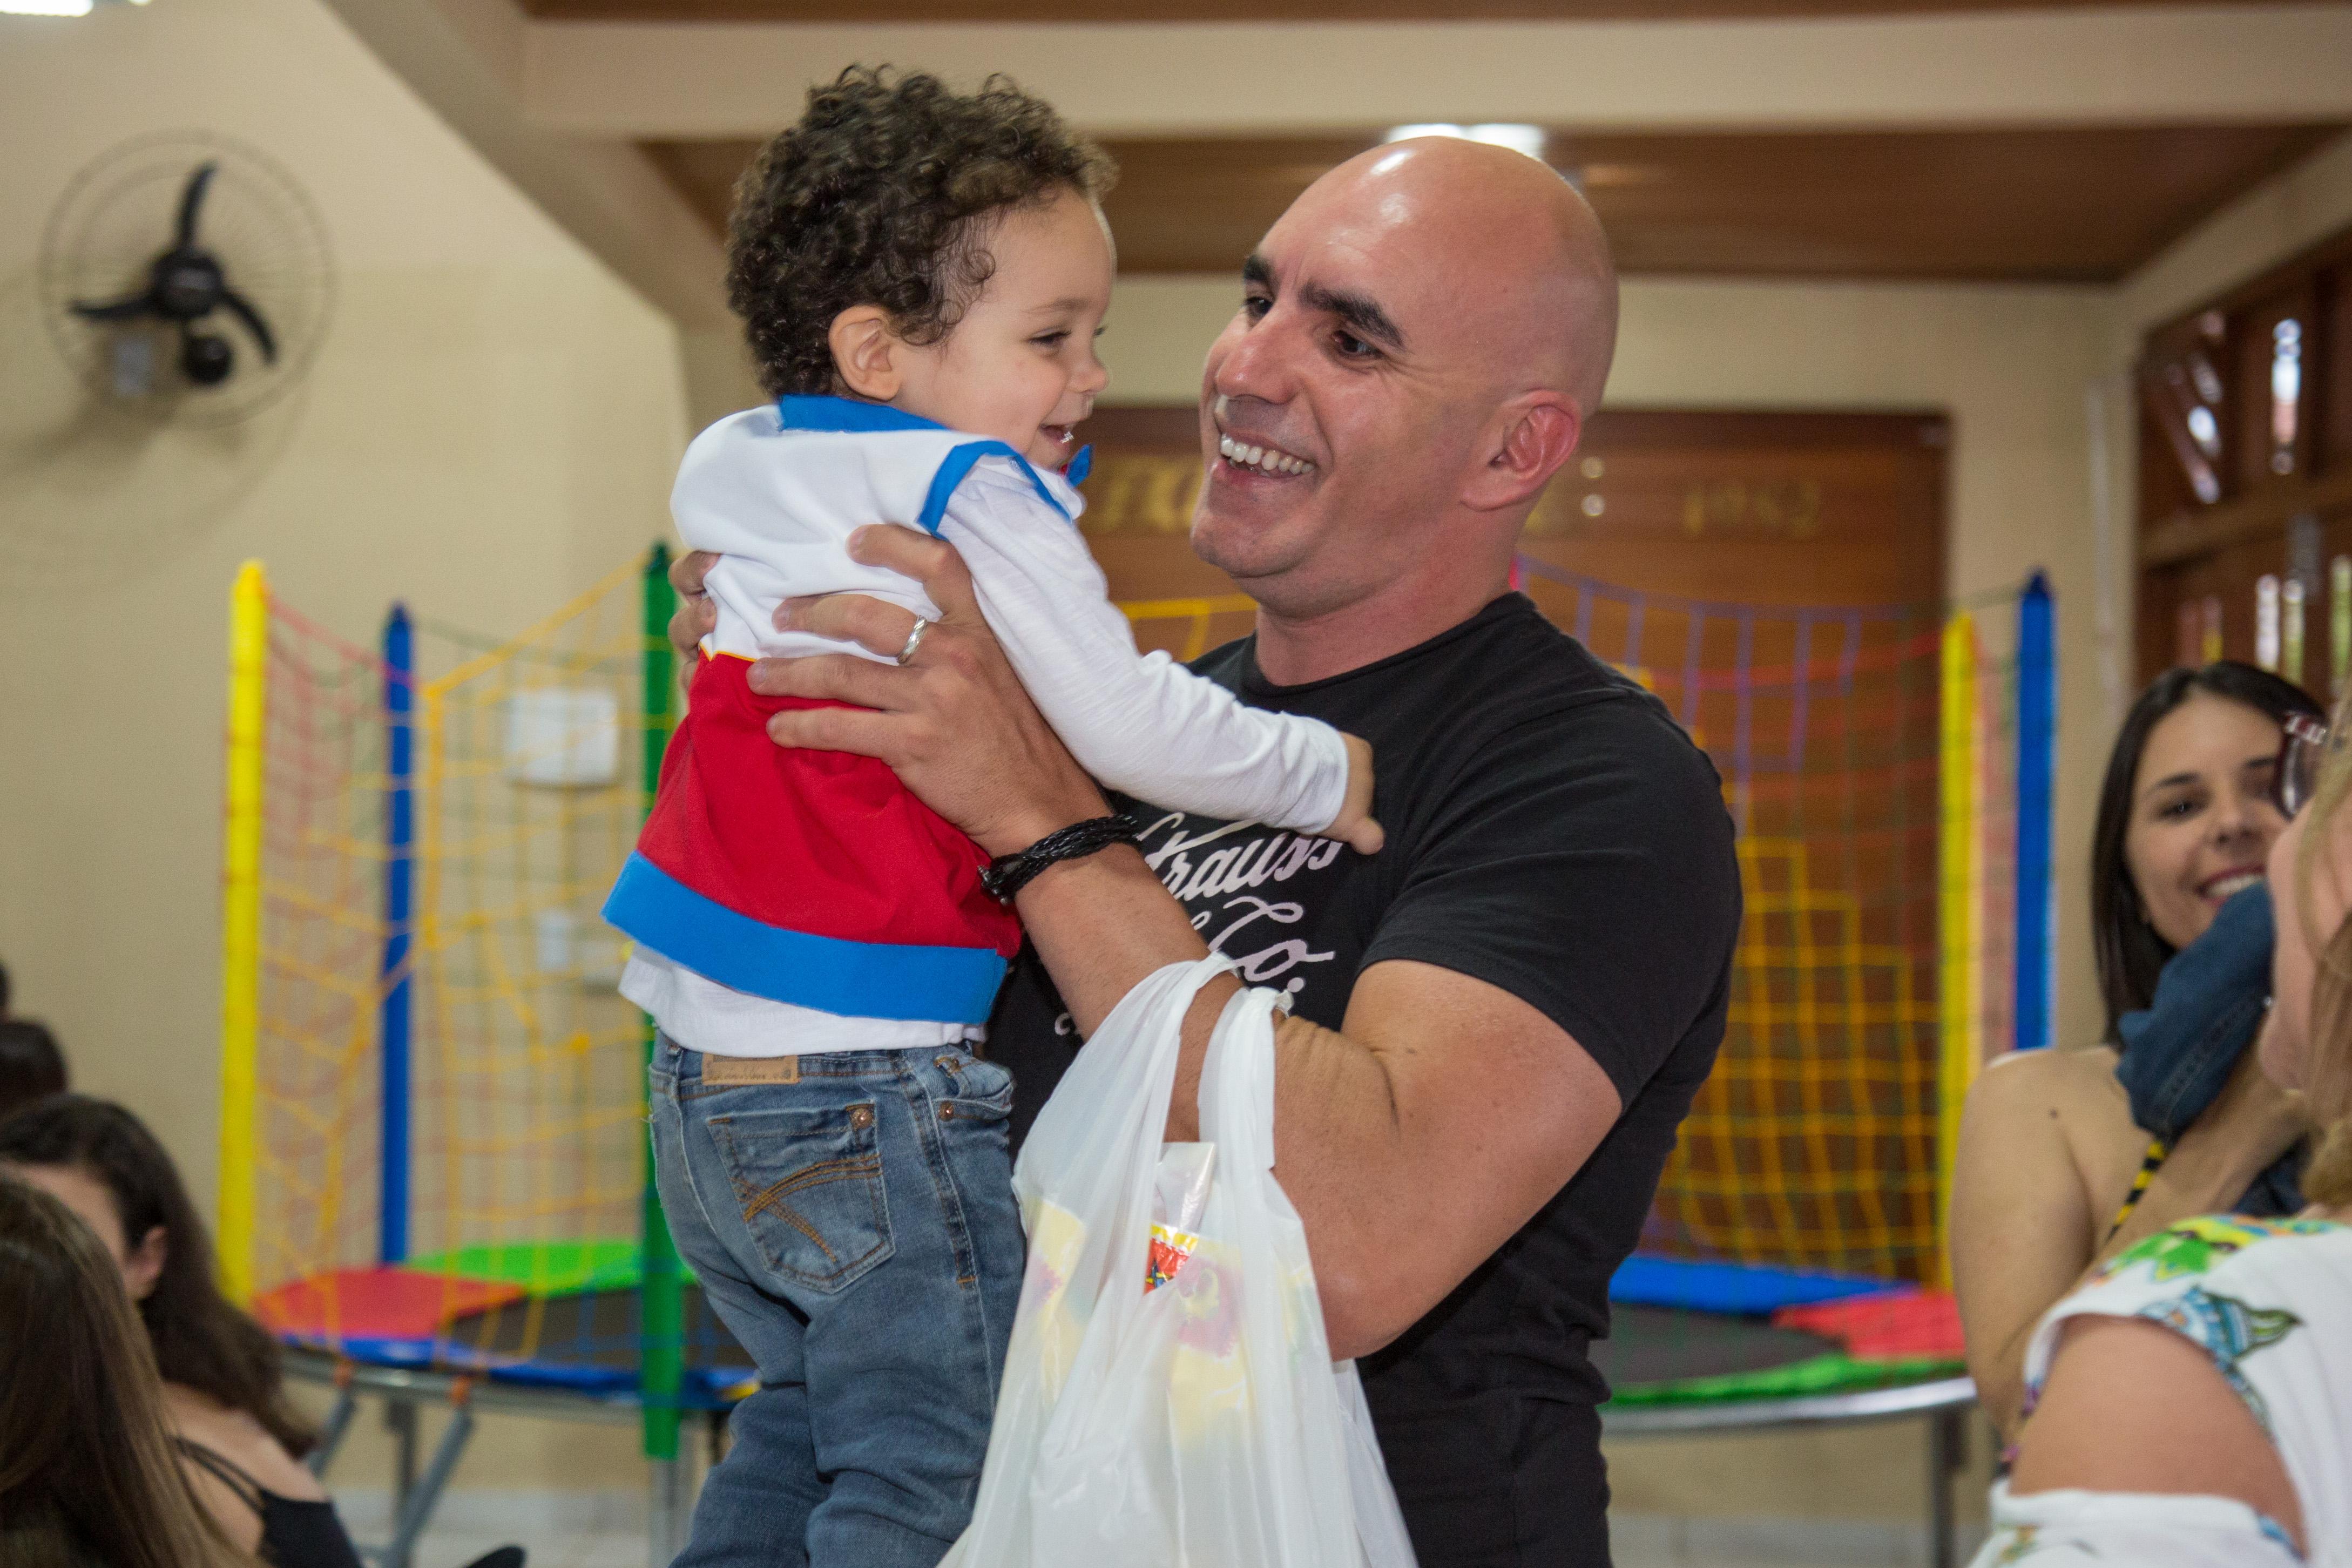 Festa‐Infantil‐Florianopolis‐Ana‐Marmo‐FotografiaFesta‐Infantil‐Florianopolis‐Ana‐Marmo‐Fotografia191A0668